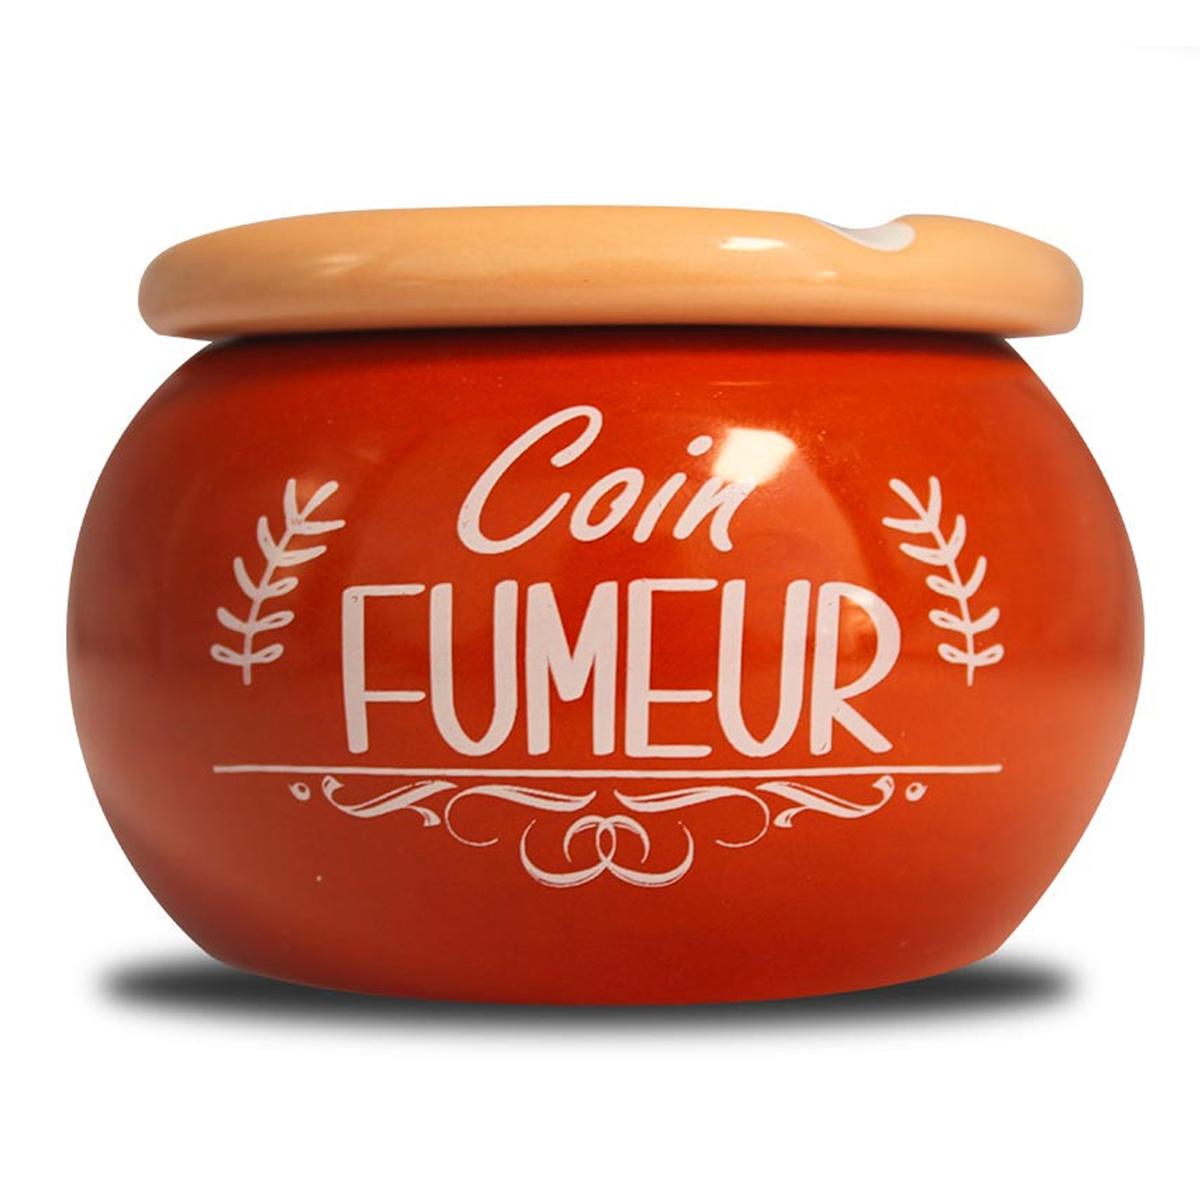 Cendrier marocain céramique \'Messages\' corail (Coin Fumeur) - 9x6 cm - [A0566]